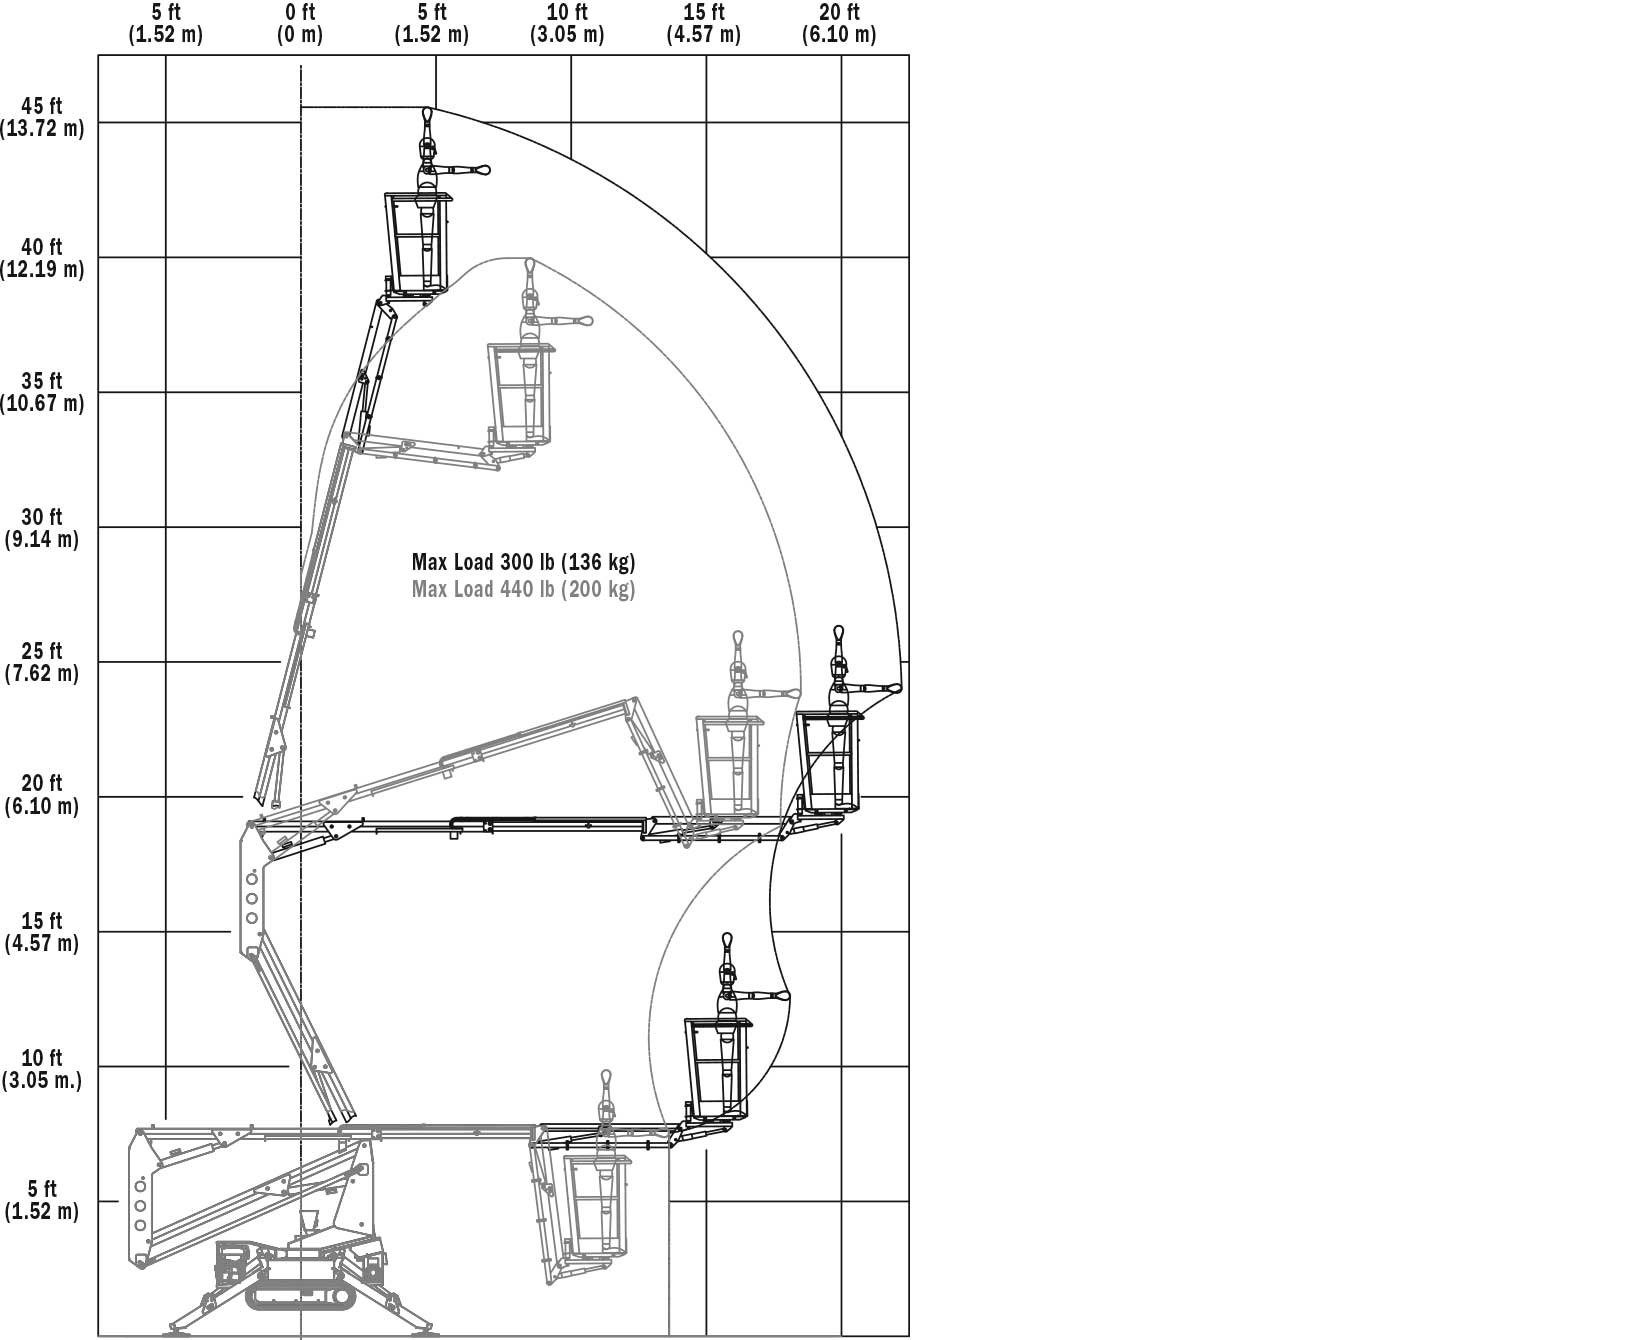 Bay Area Spider Lift Compact Crawler Atrium Lift Rental